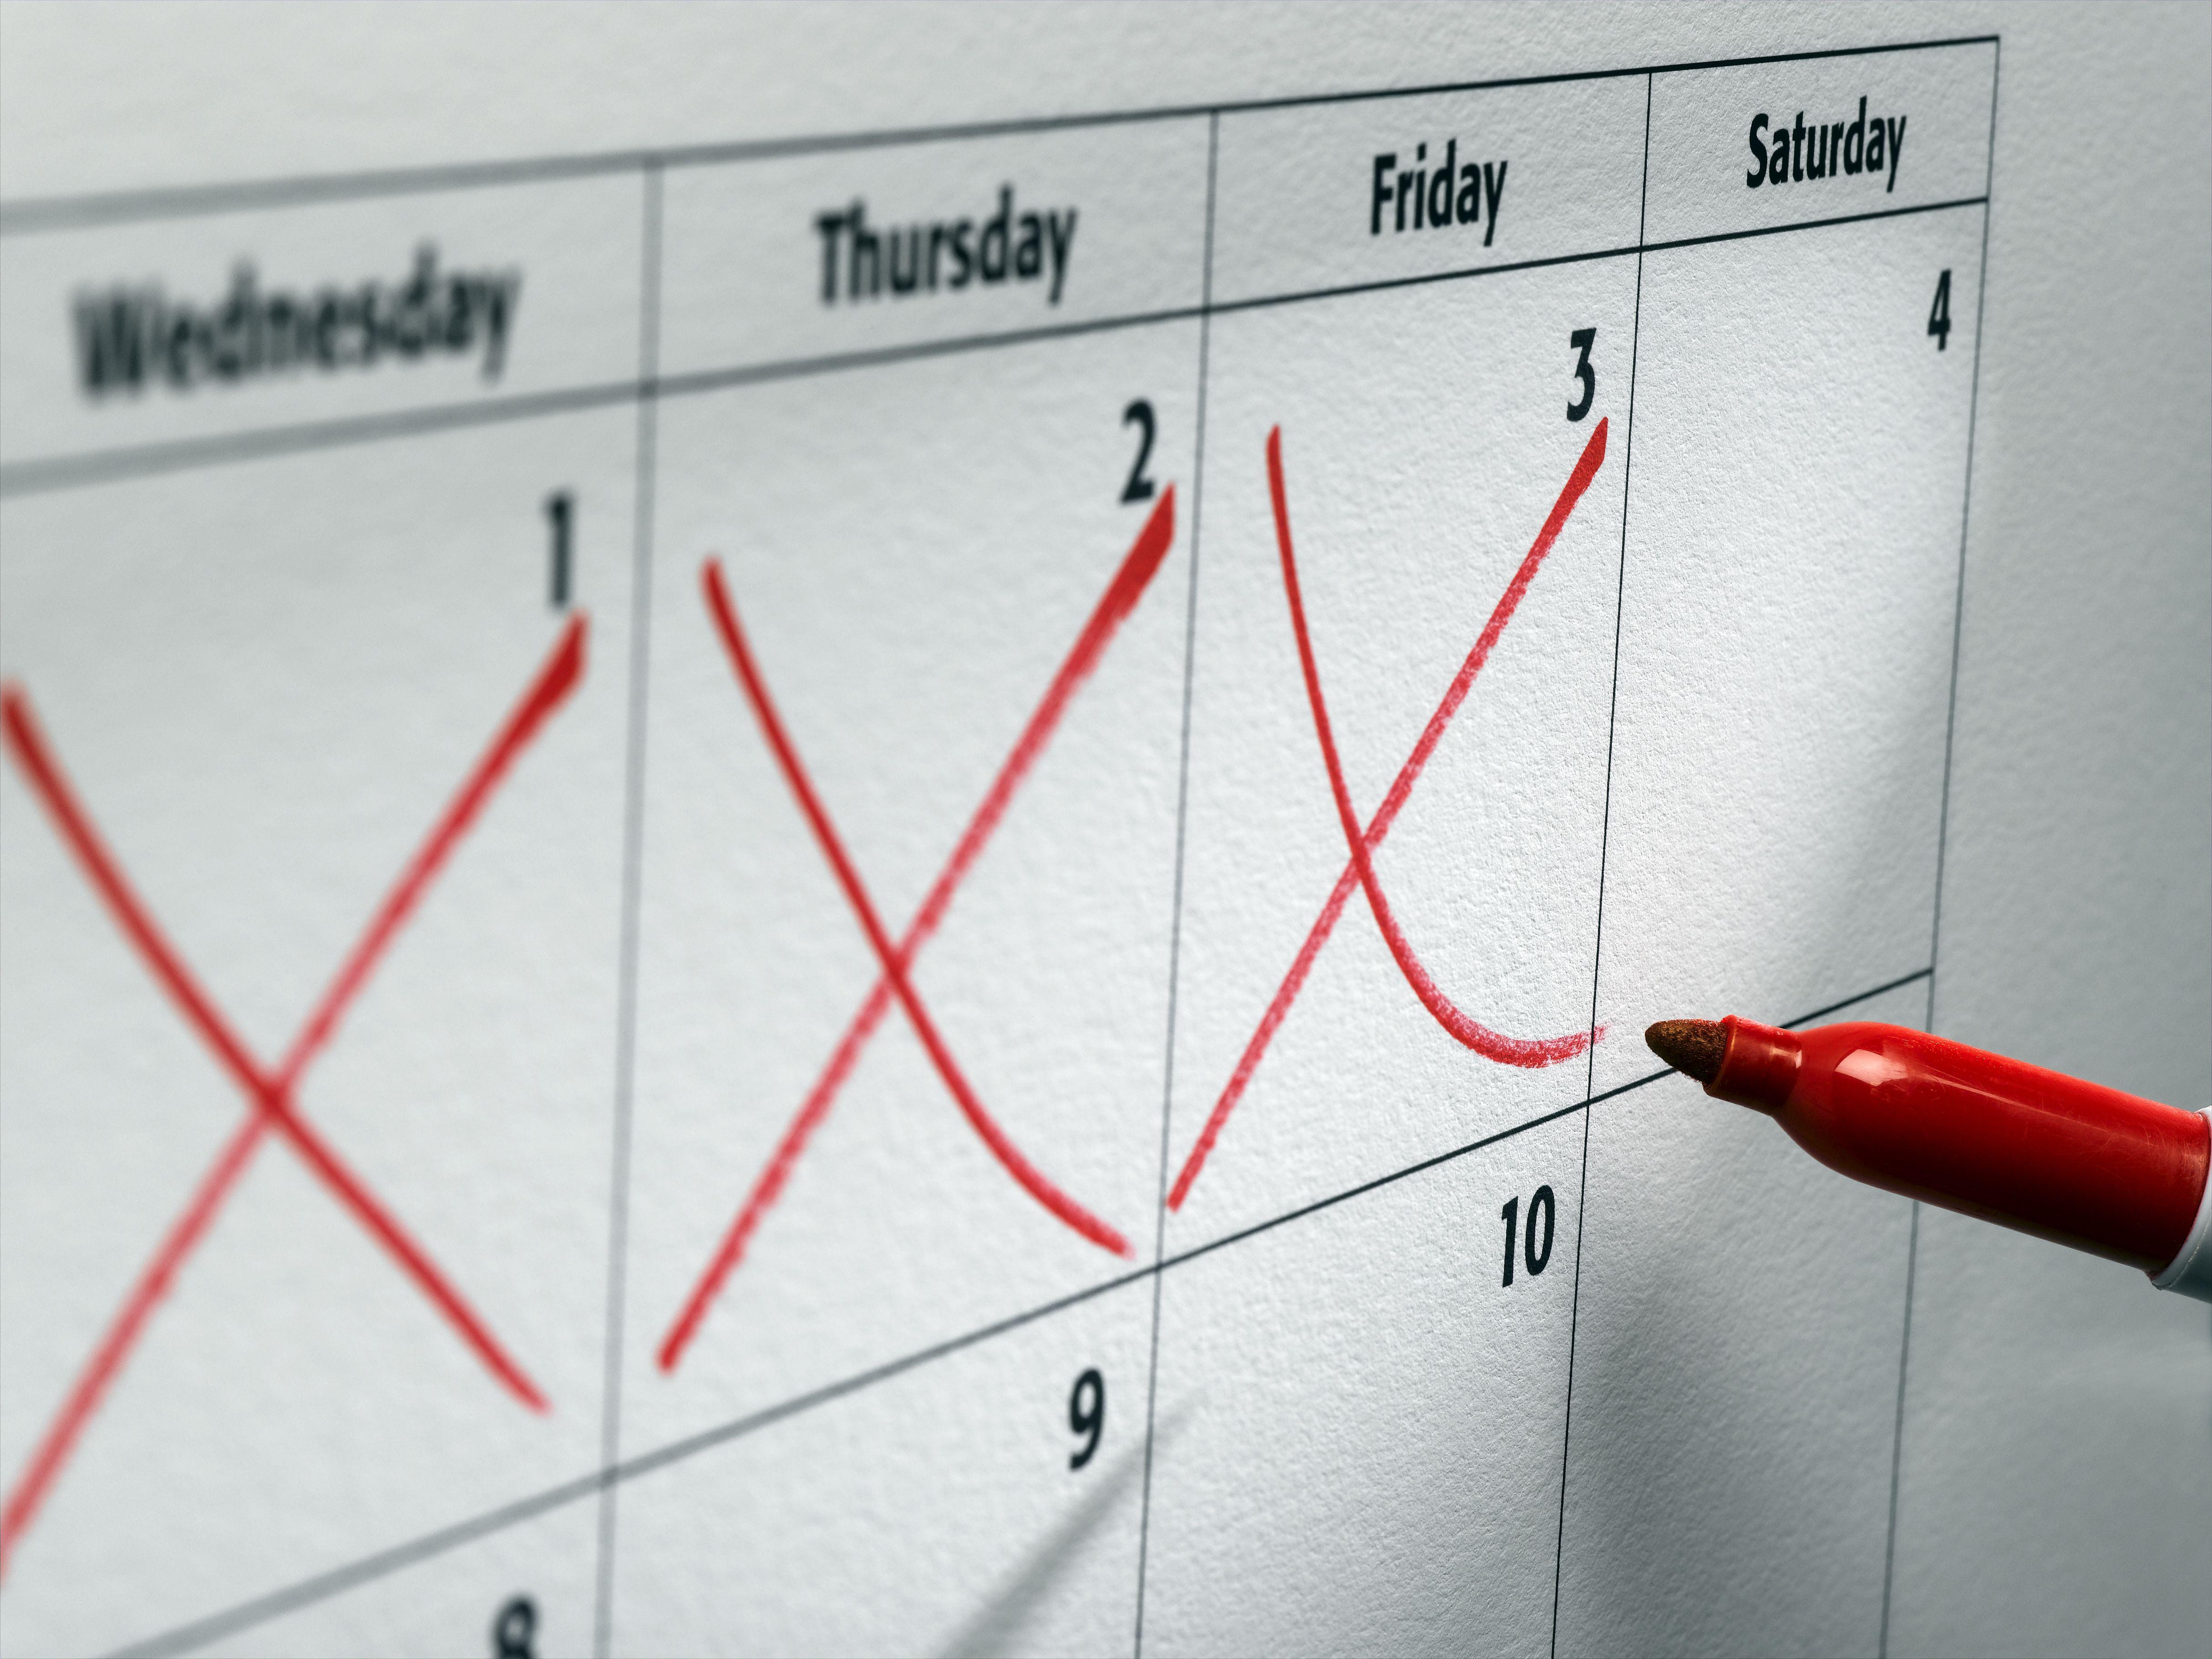 Three days crossed off on wall calendar, close-up